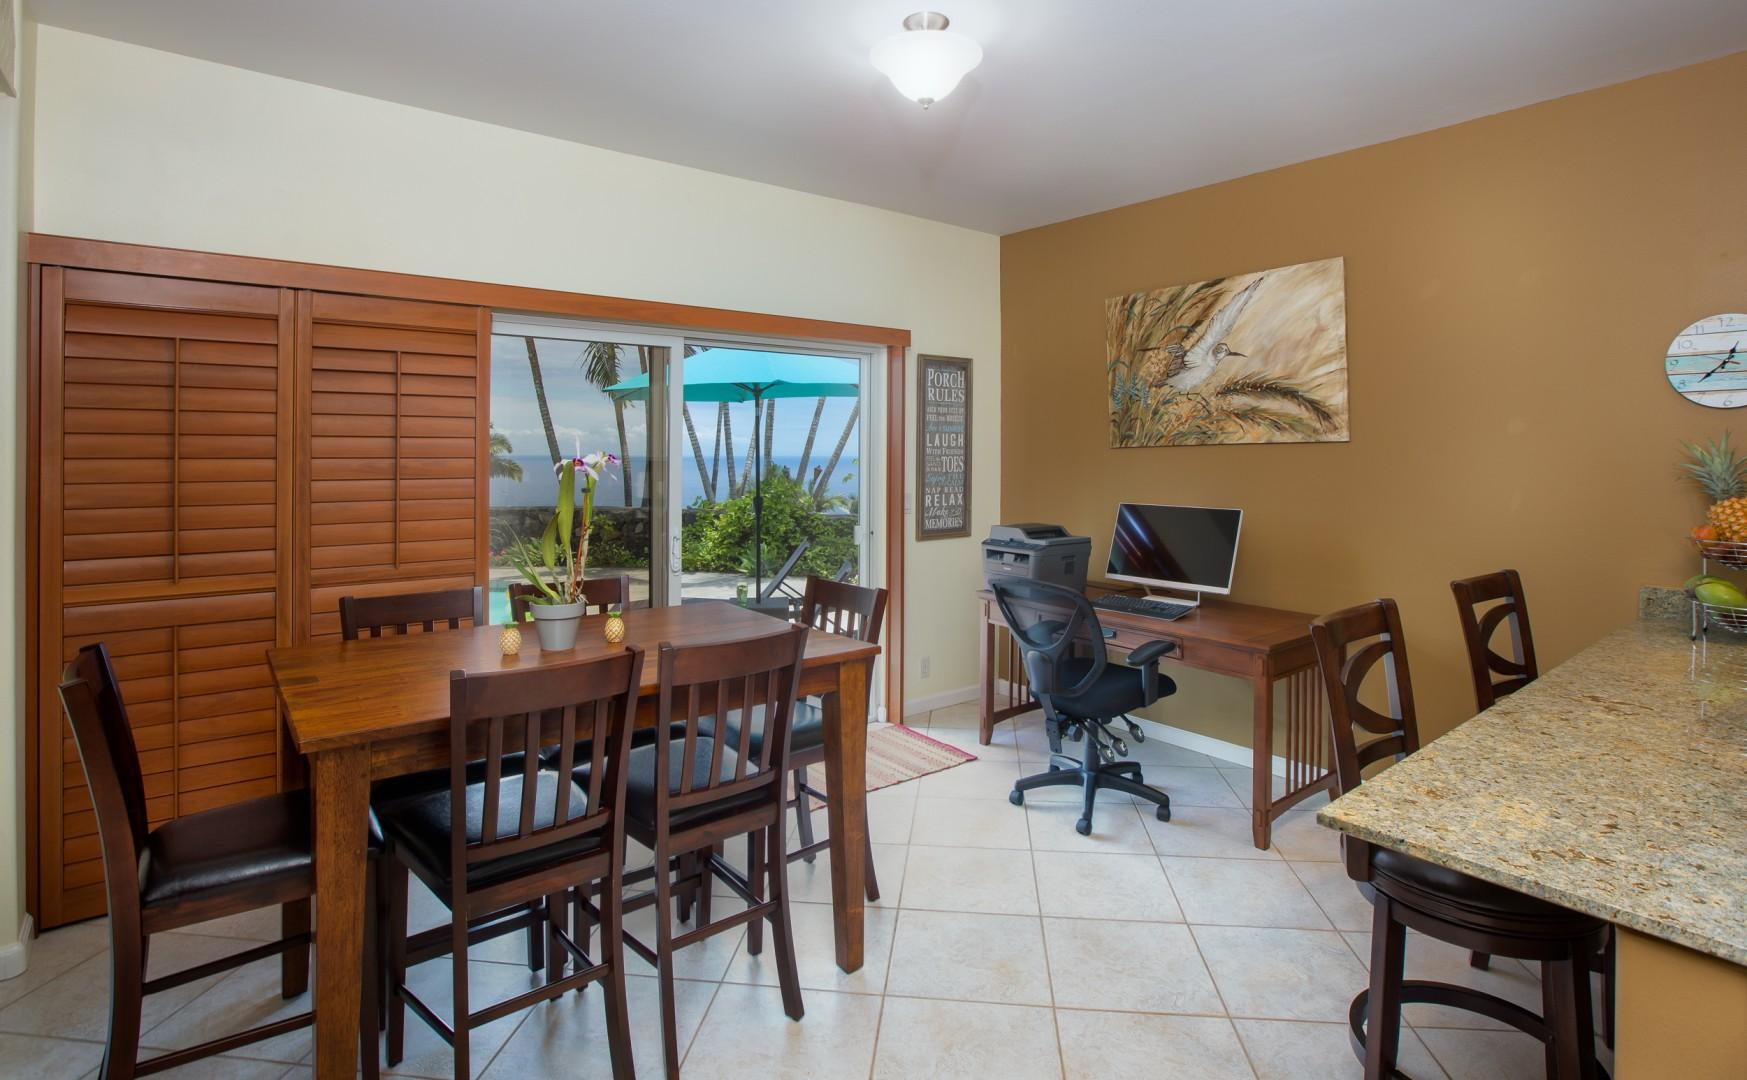 Bonus amenities: large-screen computer, wireless mouse, keyboard, and printer!